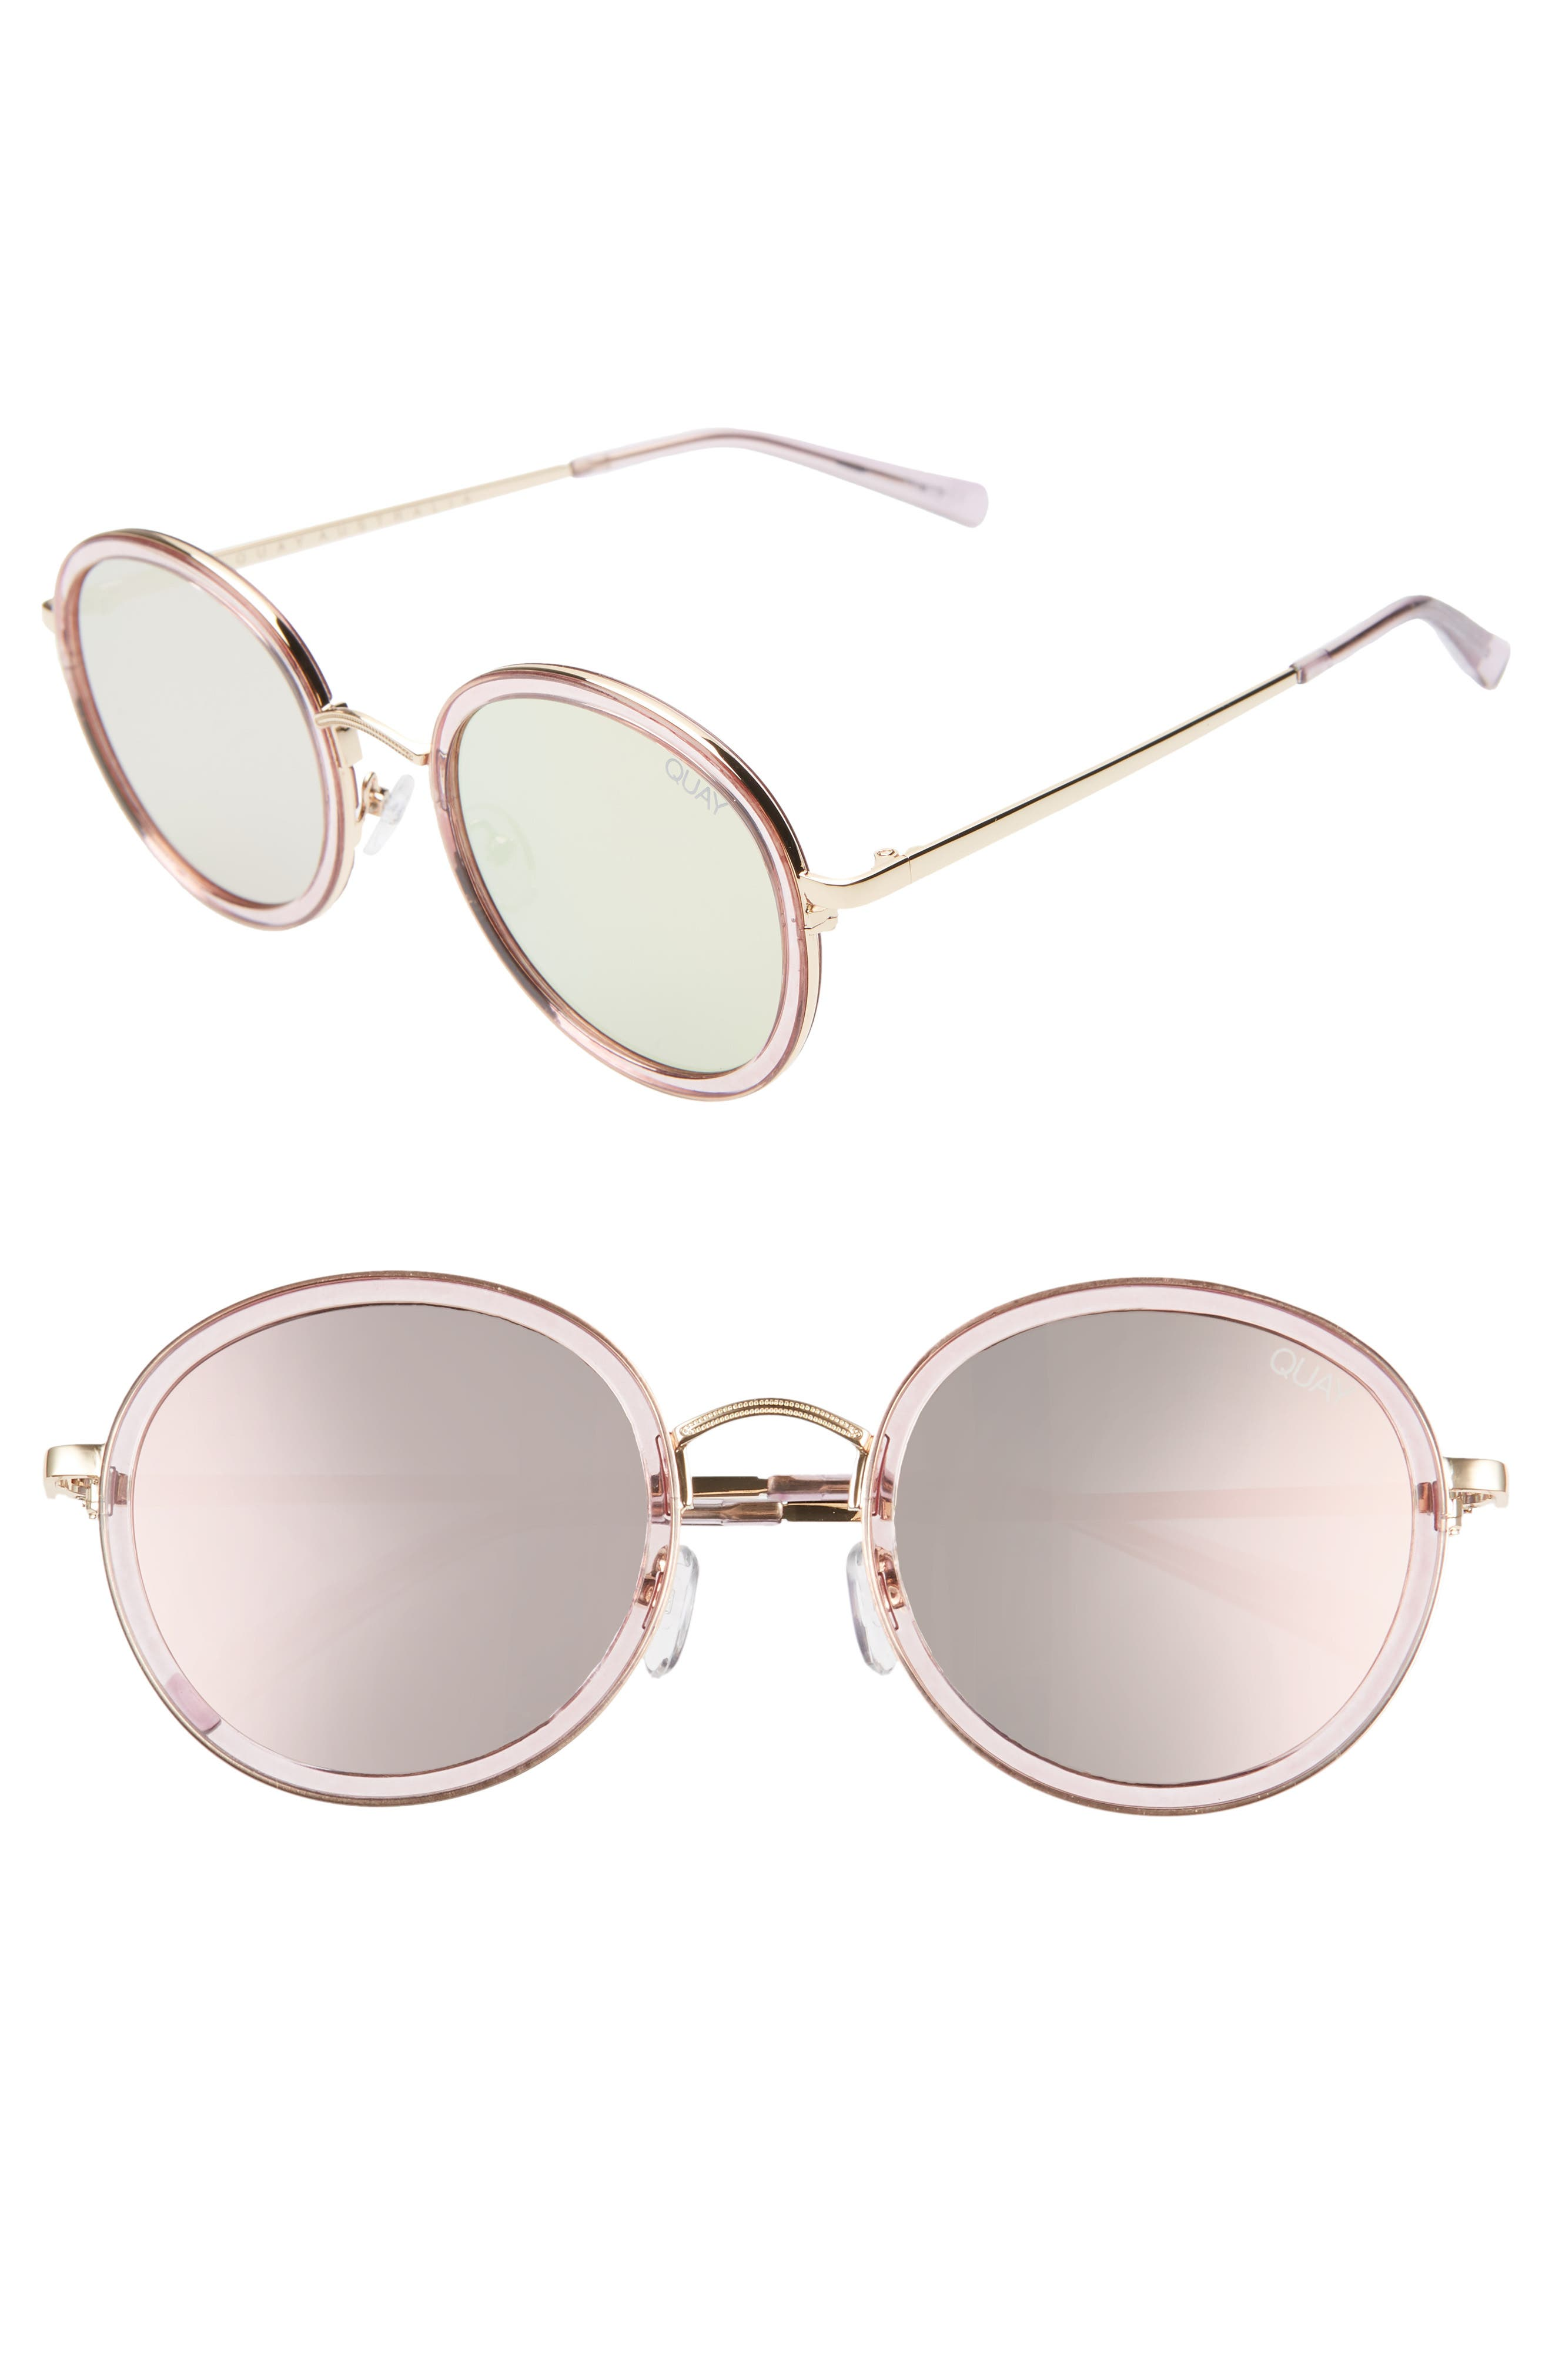 Quay Australia Firefly 52Mm Round Sunglasses - Violet/ Pink